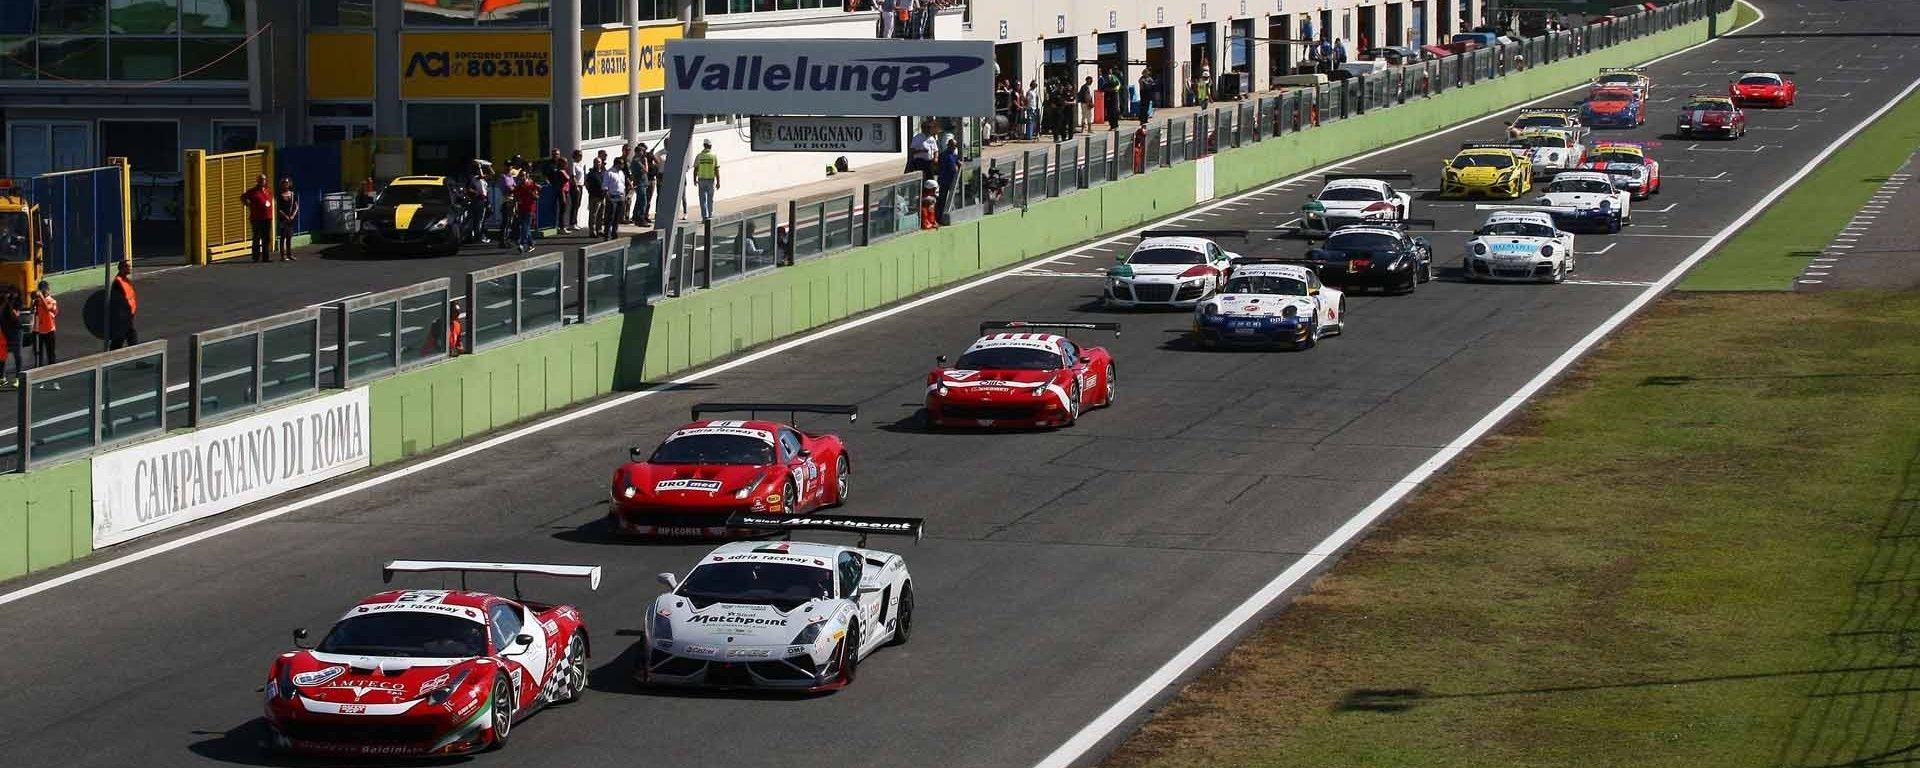 Campionato GT Italiano 2017: Circuito Vallelunga